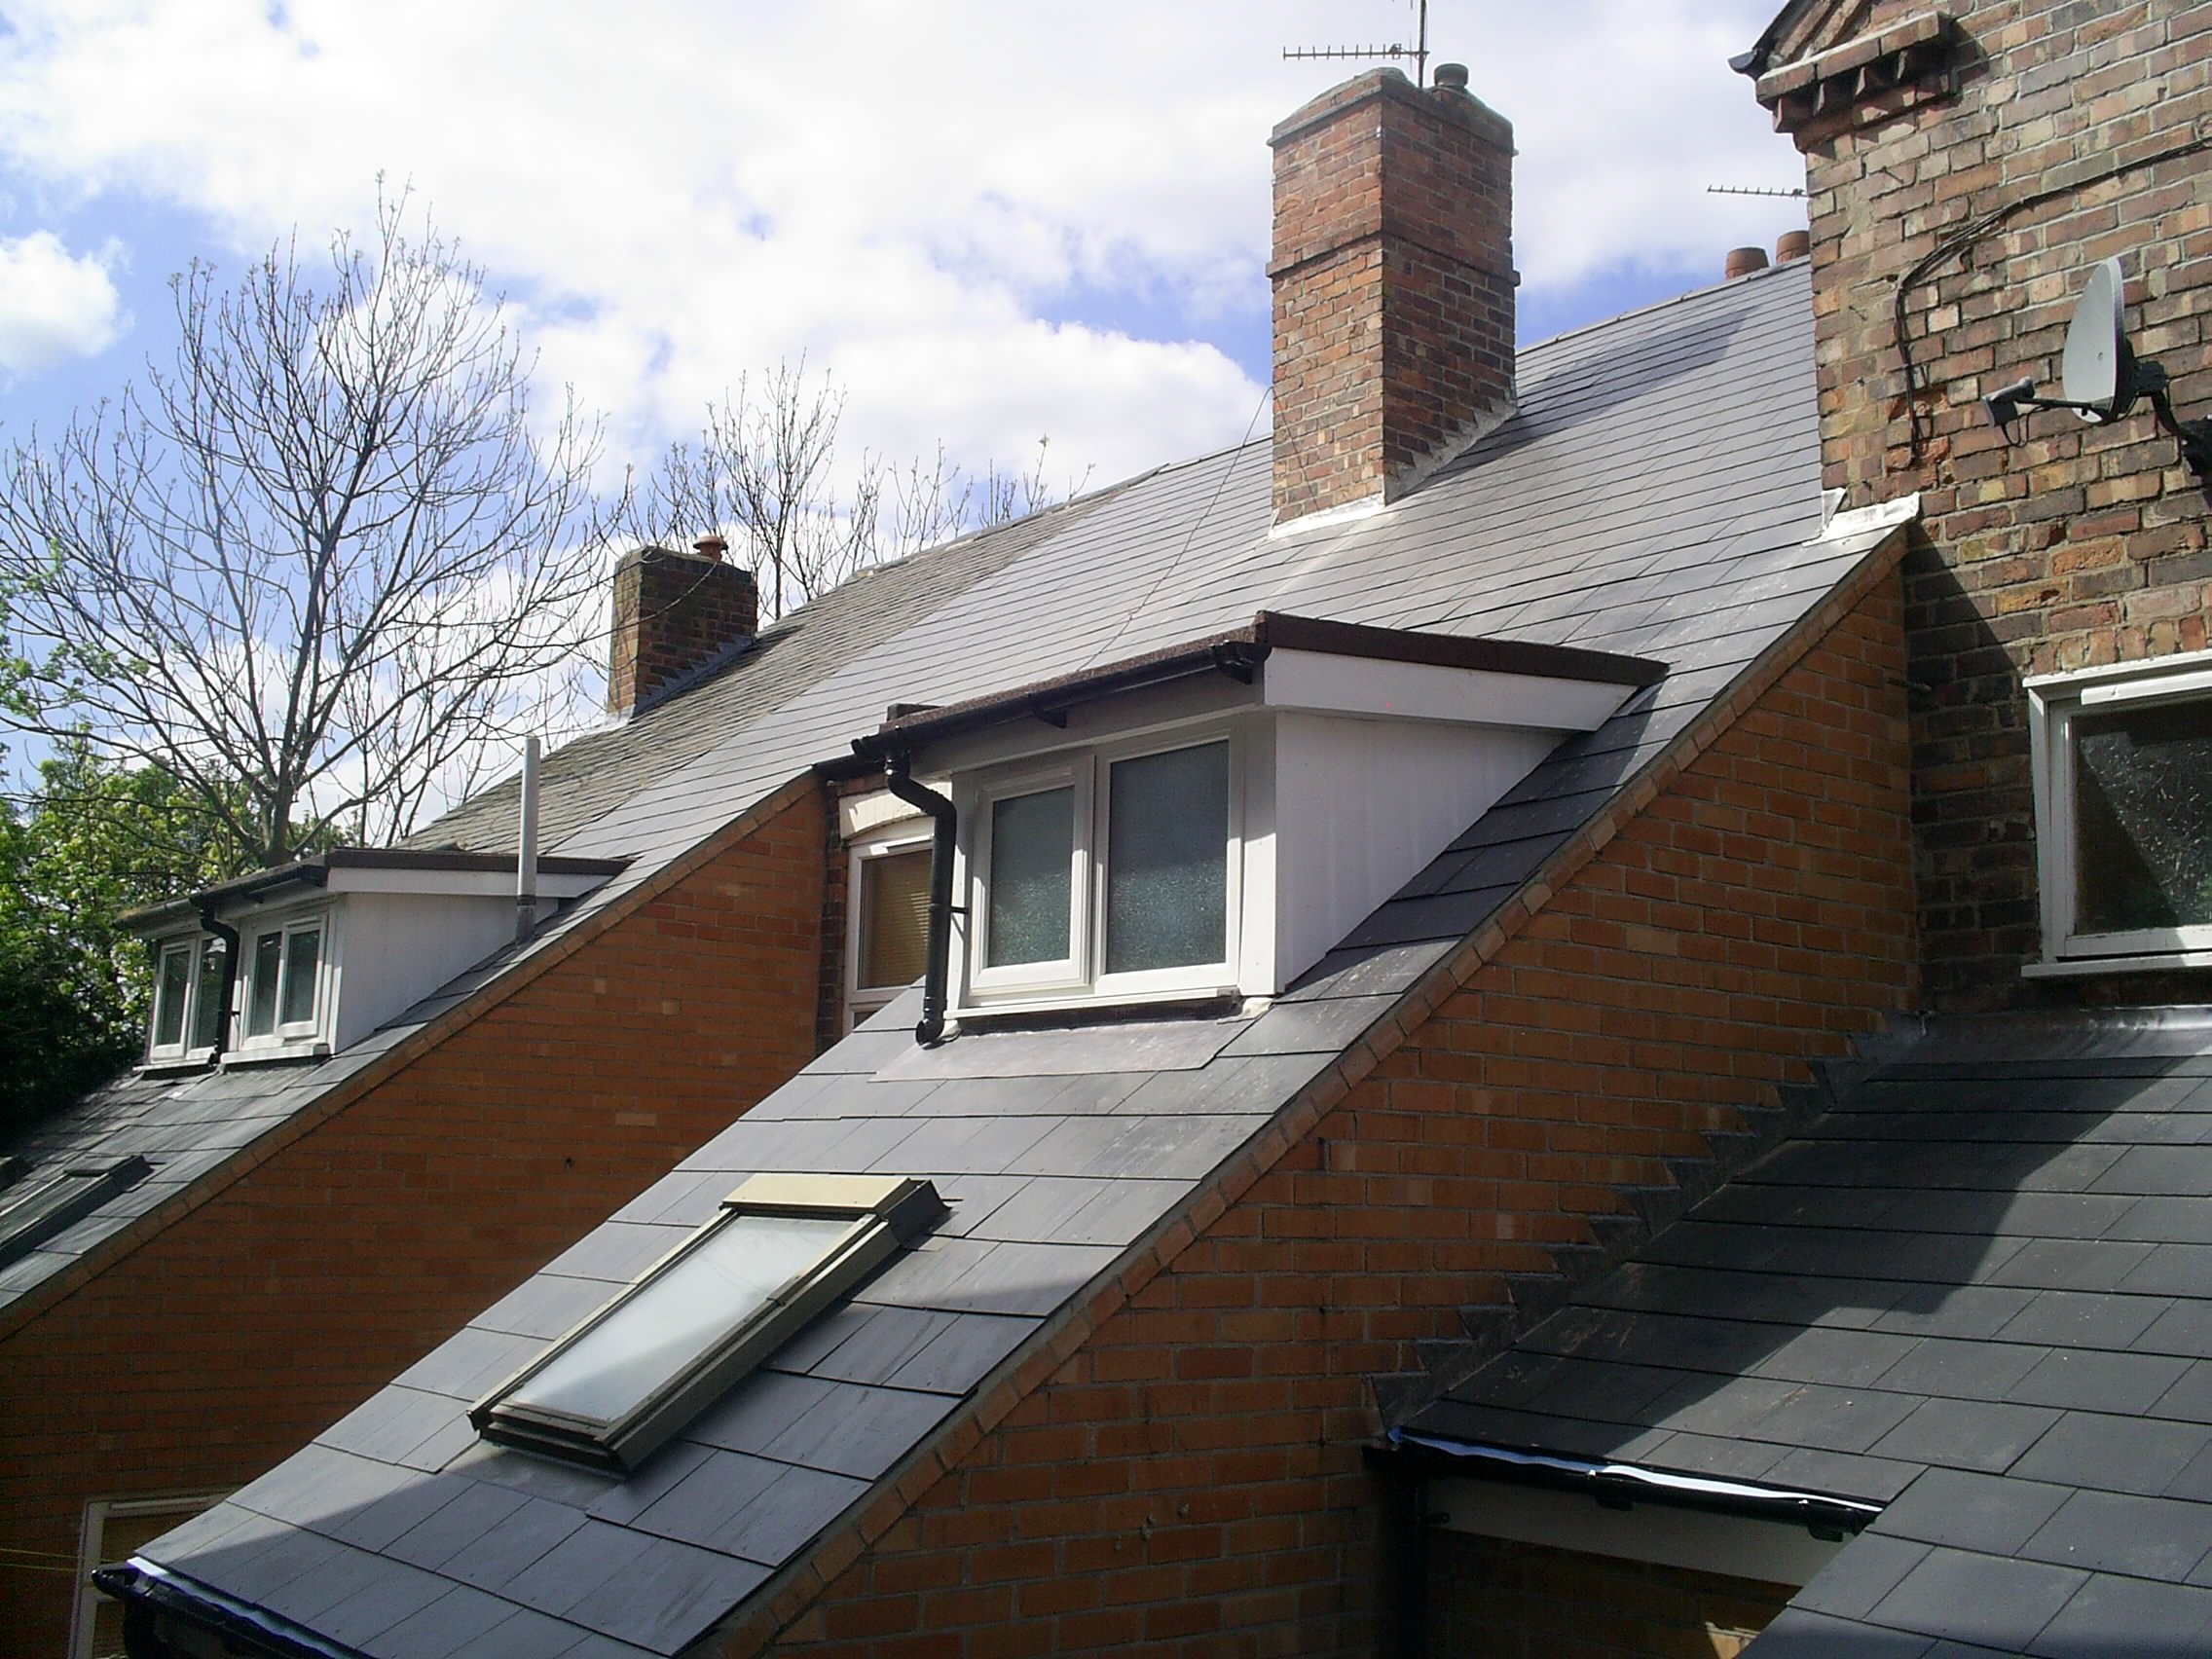 window amidst roof